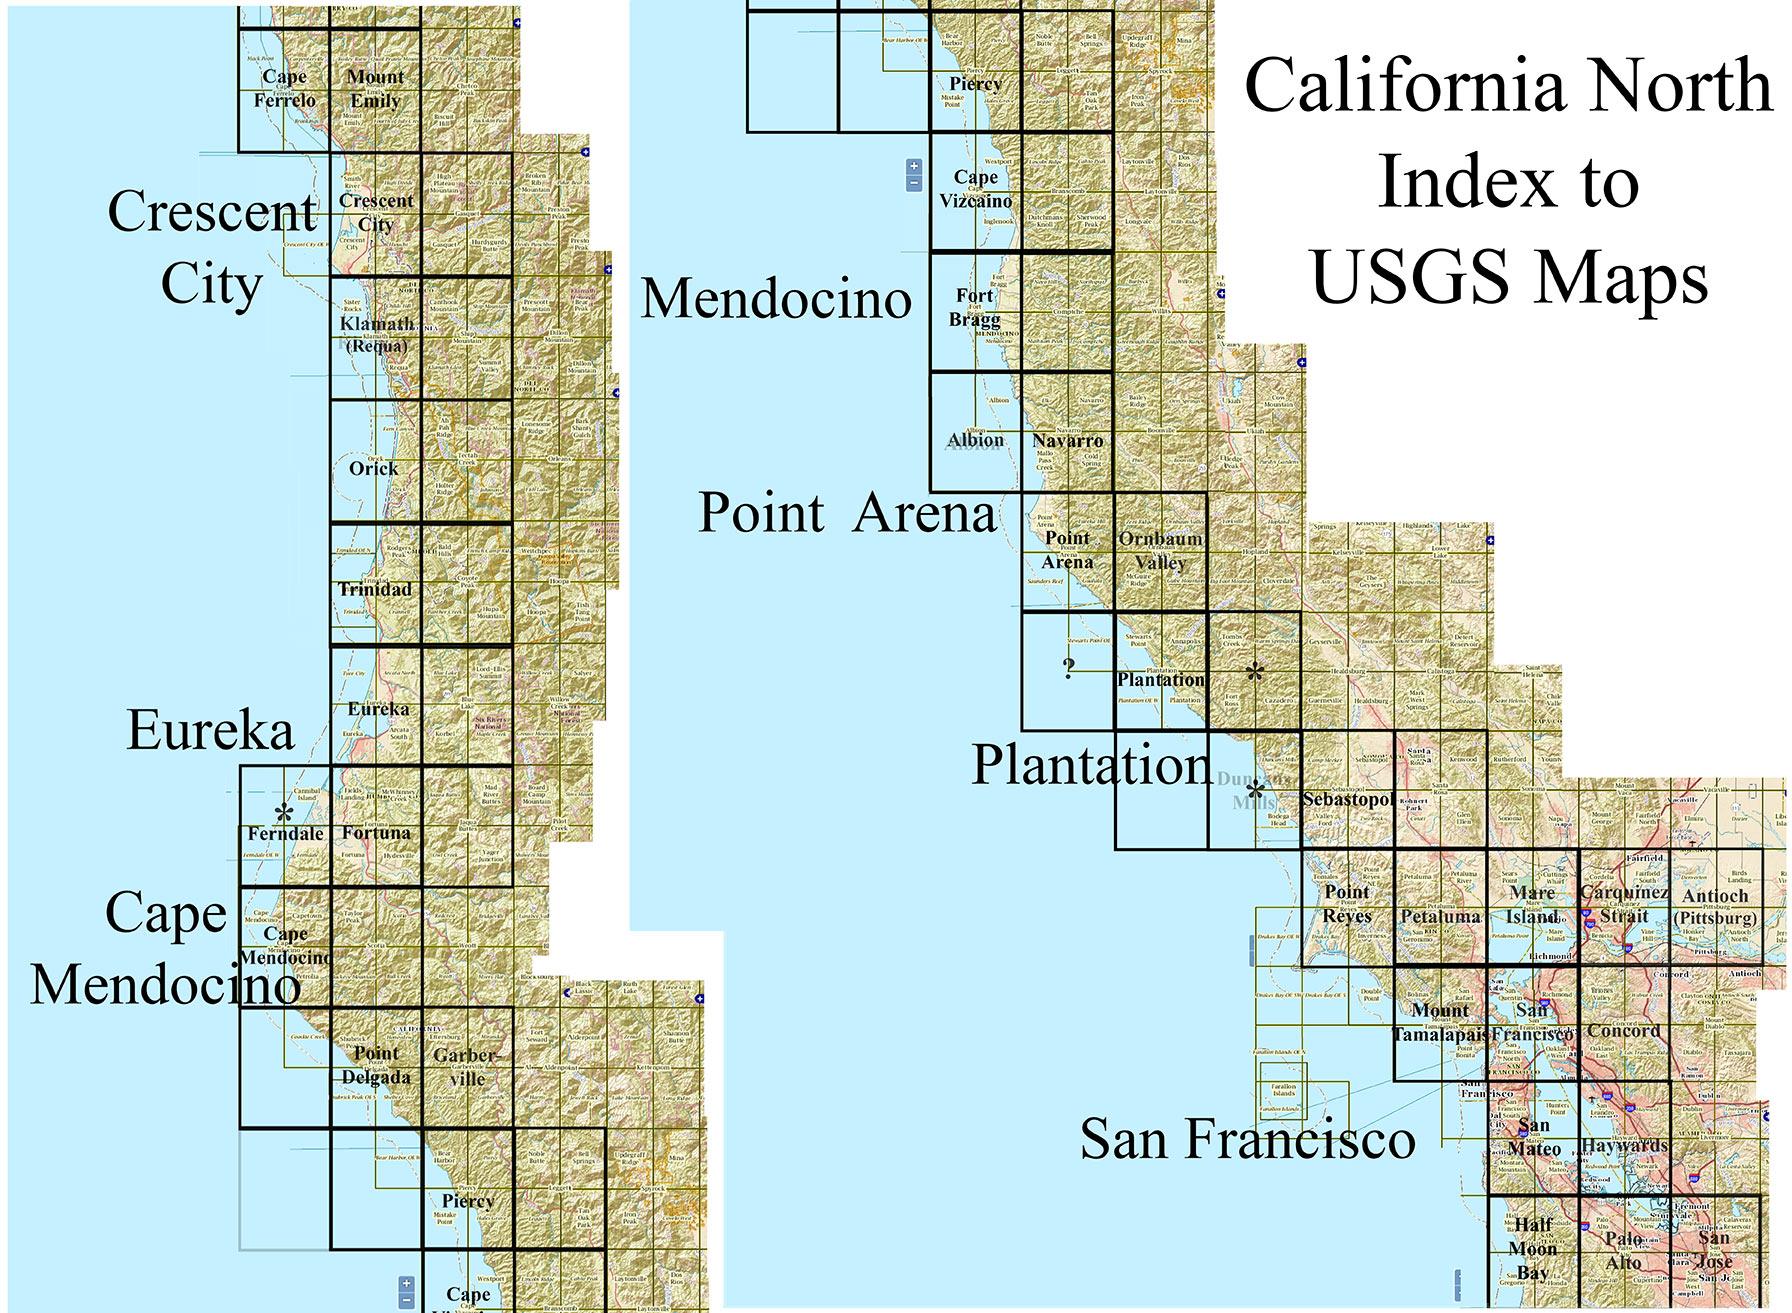 ca-coast-usgs-index-north-bigc-web.jpg